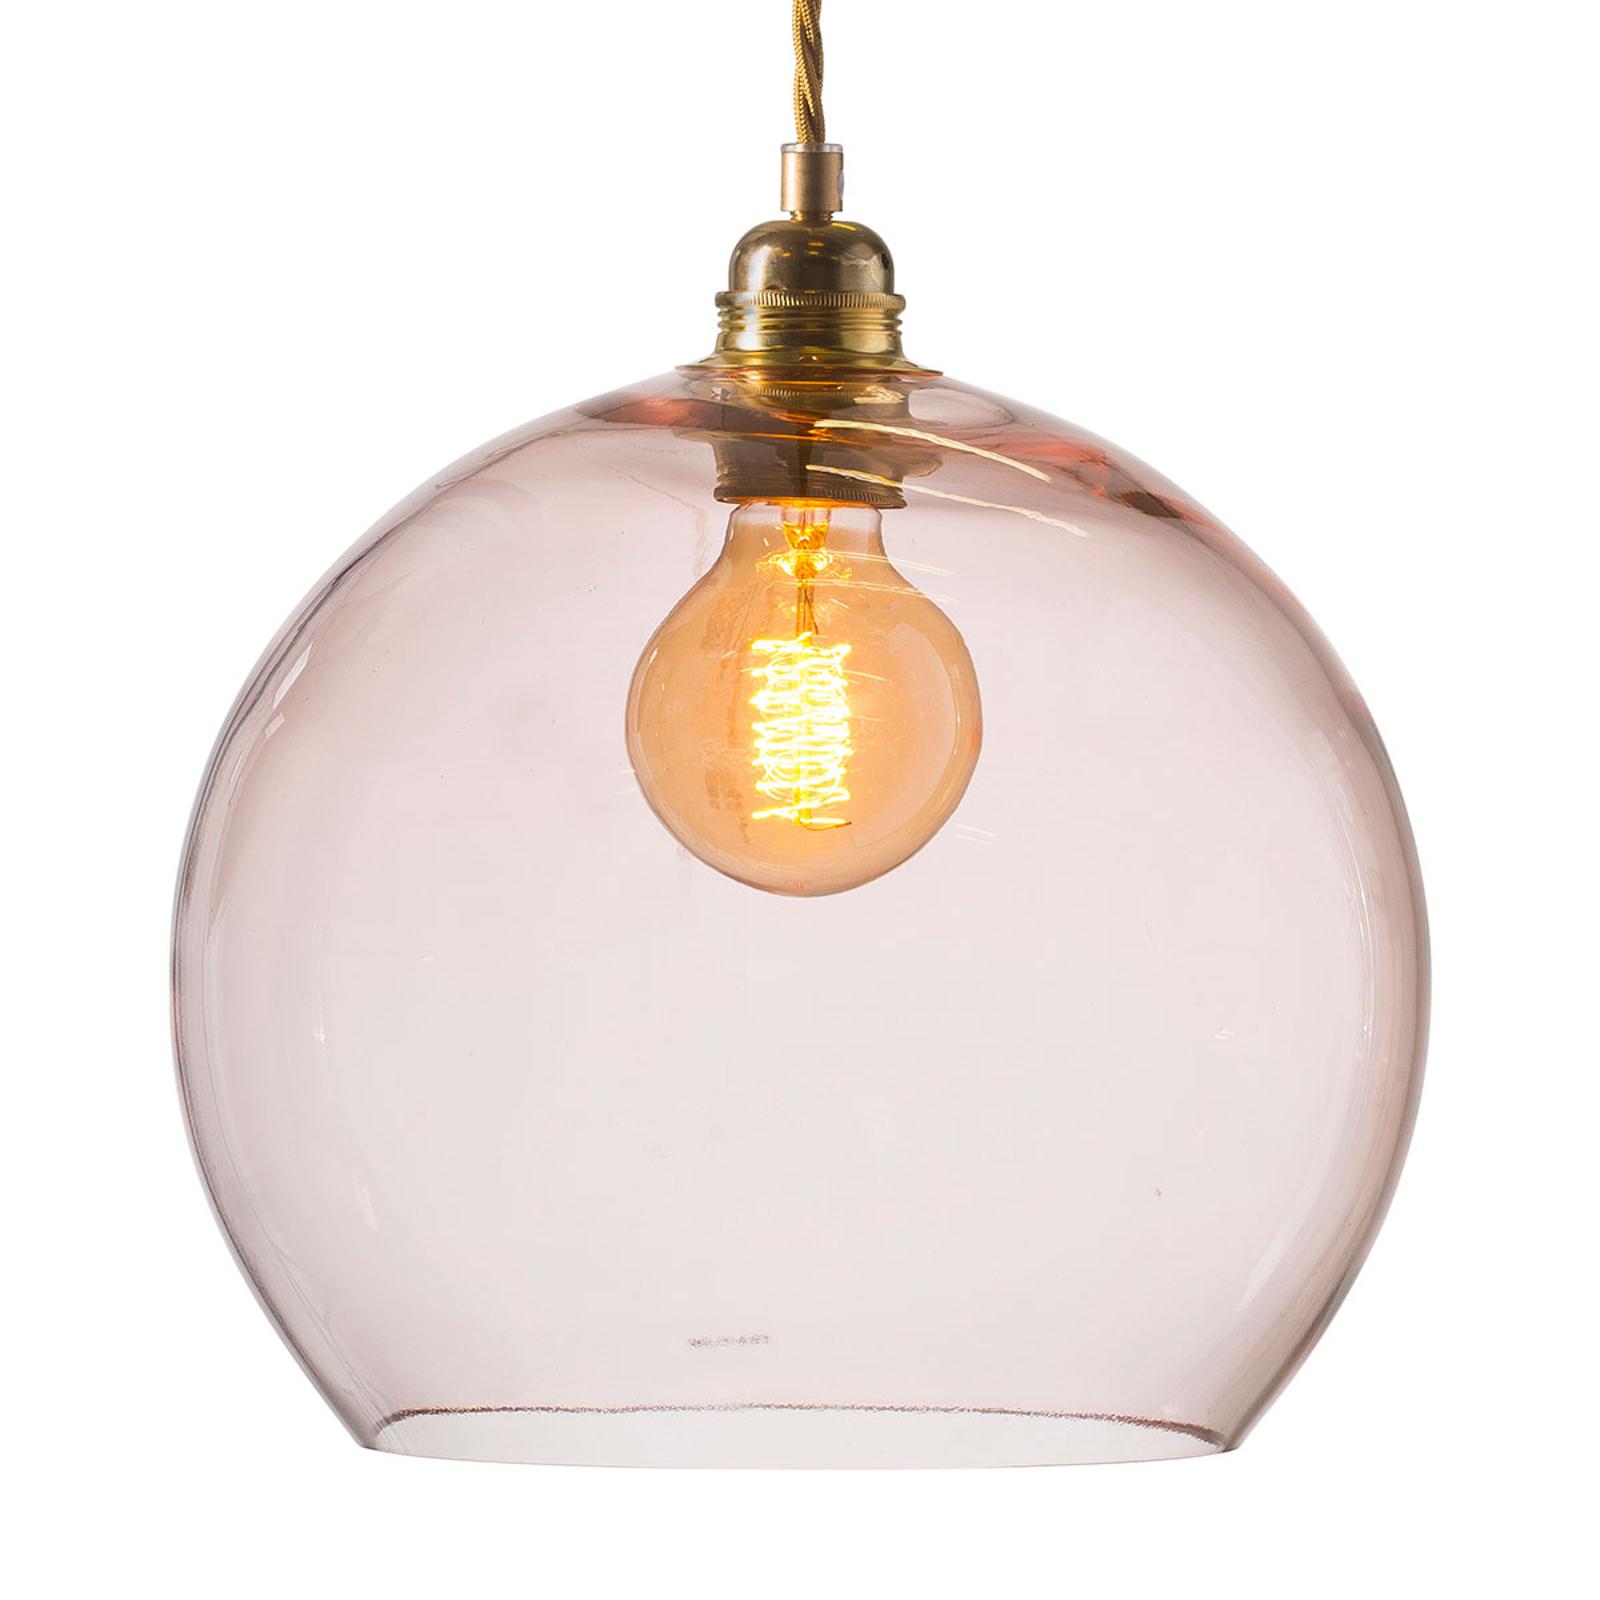 EBB & FLOW Rowan hanglamp rosé-goud Ø 28cm